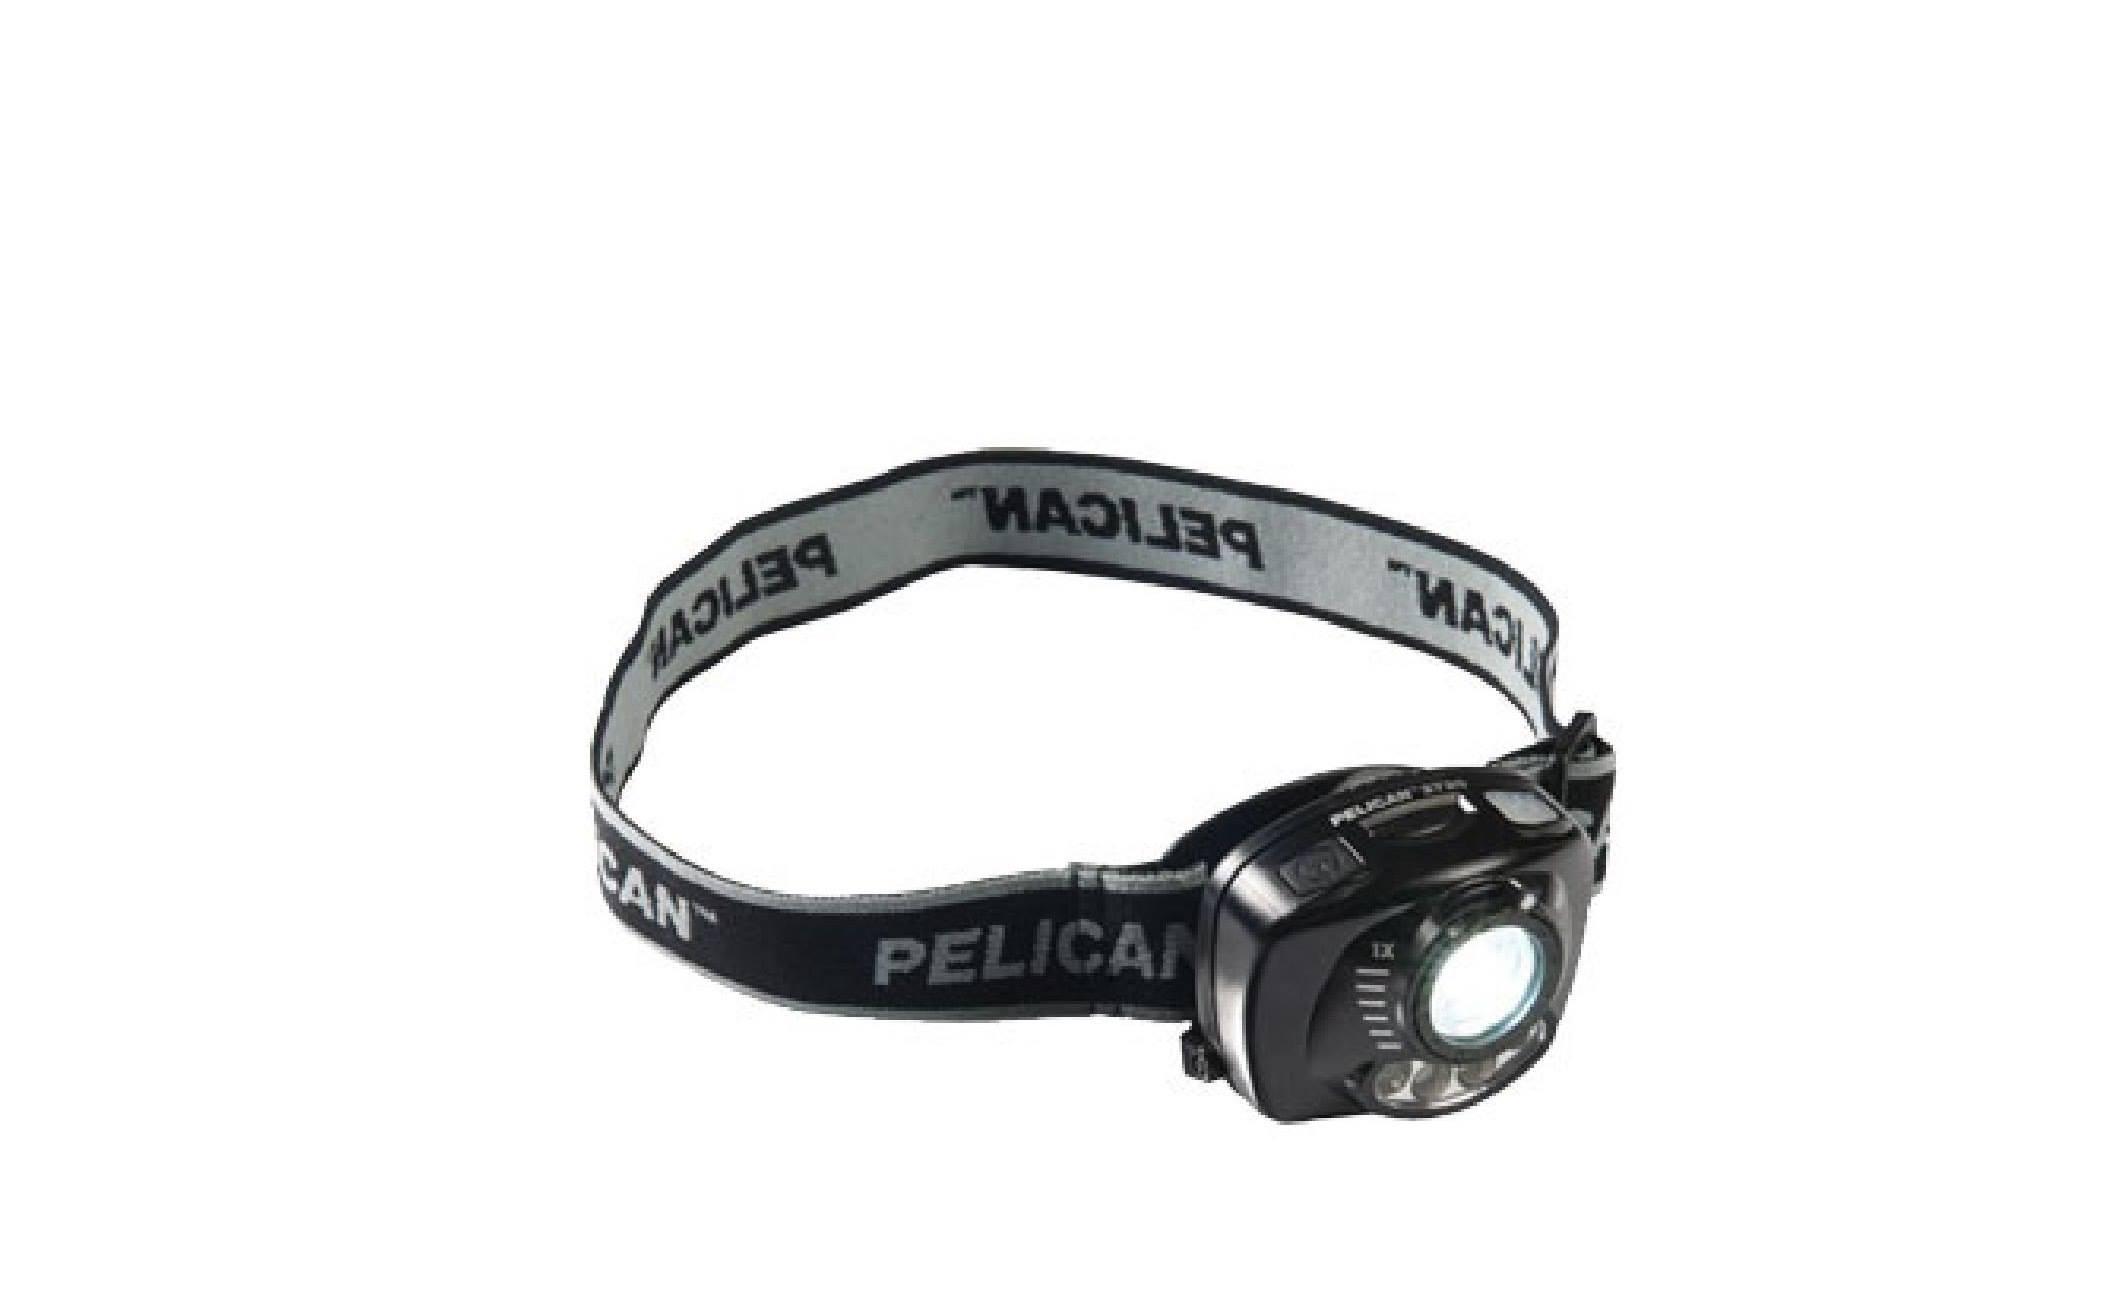 Flashlight Approvals รุ่น 2720(ไม่กันระเบิด) ยี่ห้อ Pelican